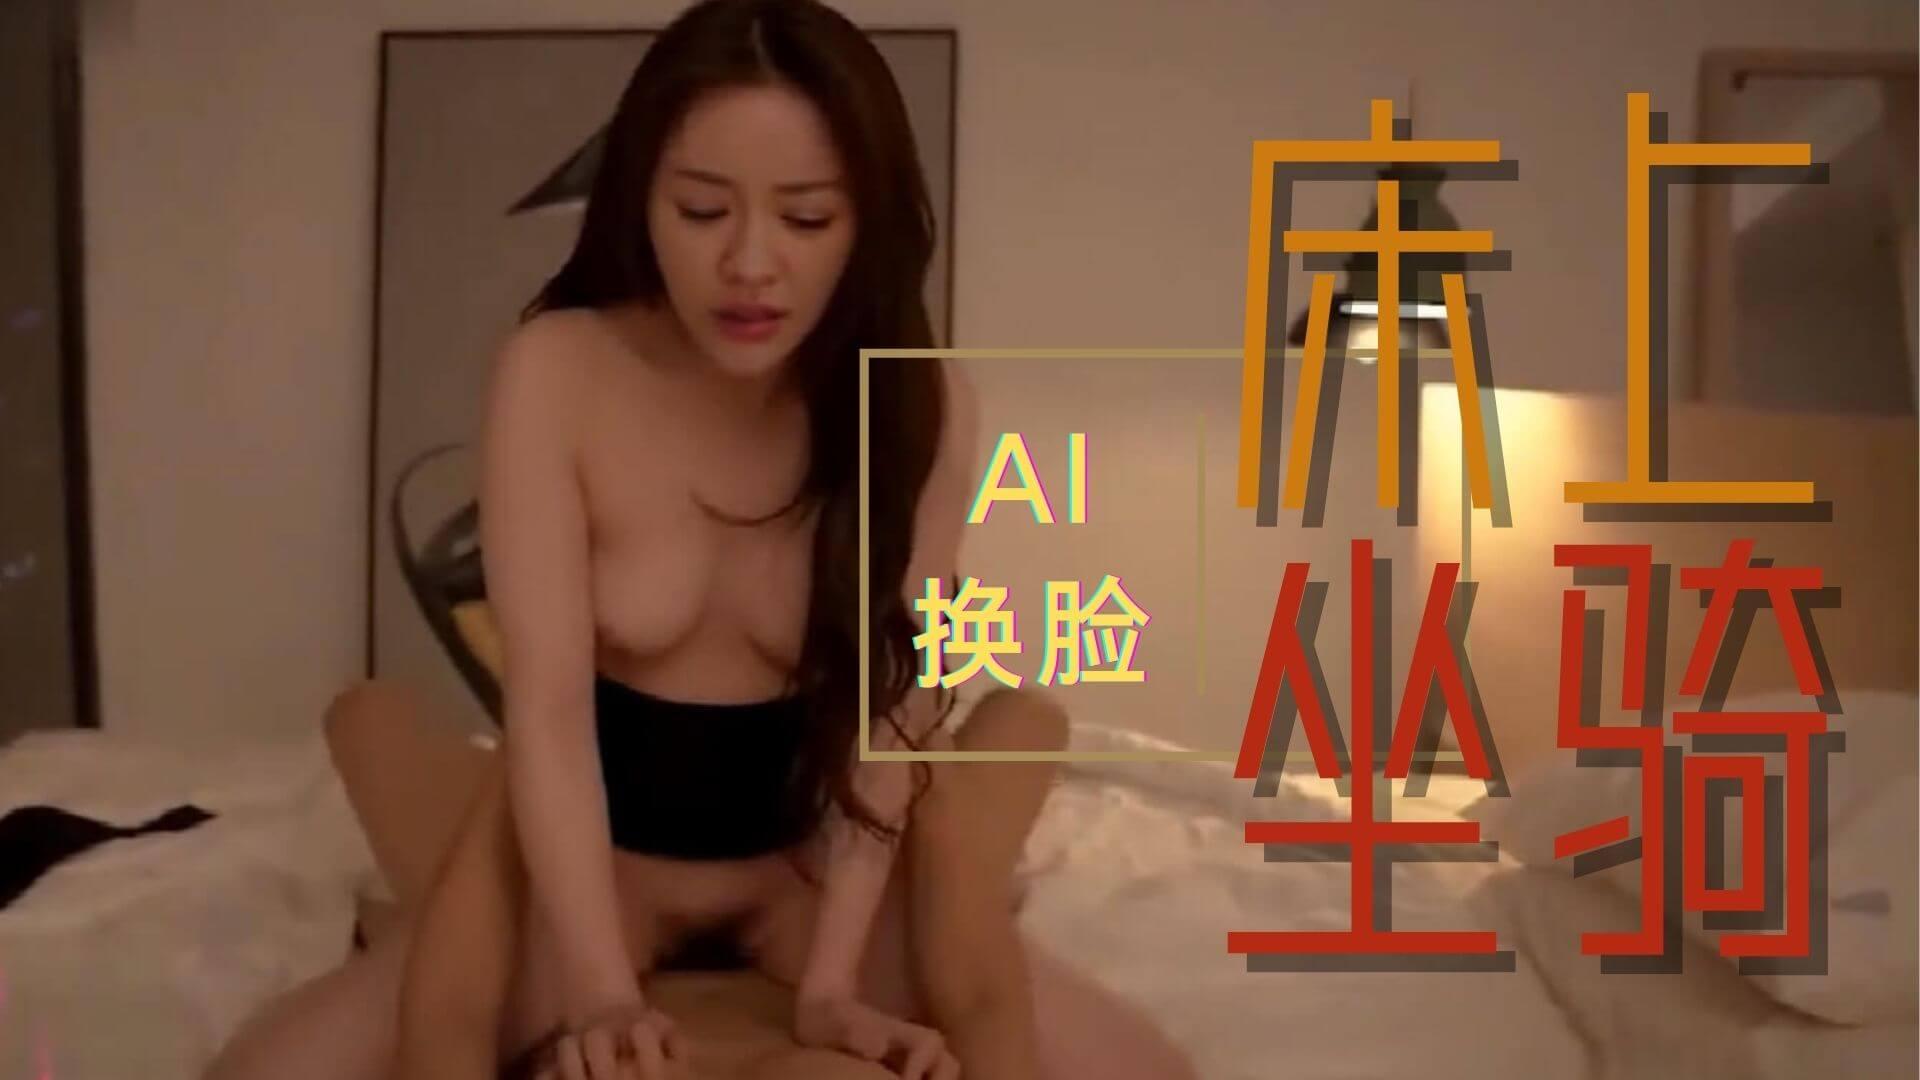 Al—陈意涵 国语剧情